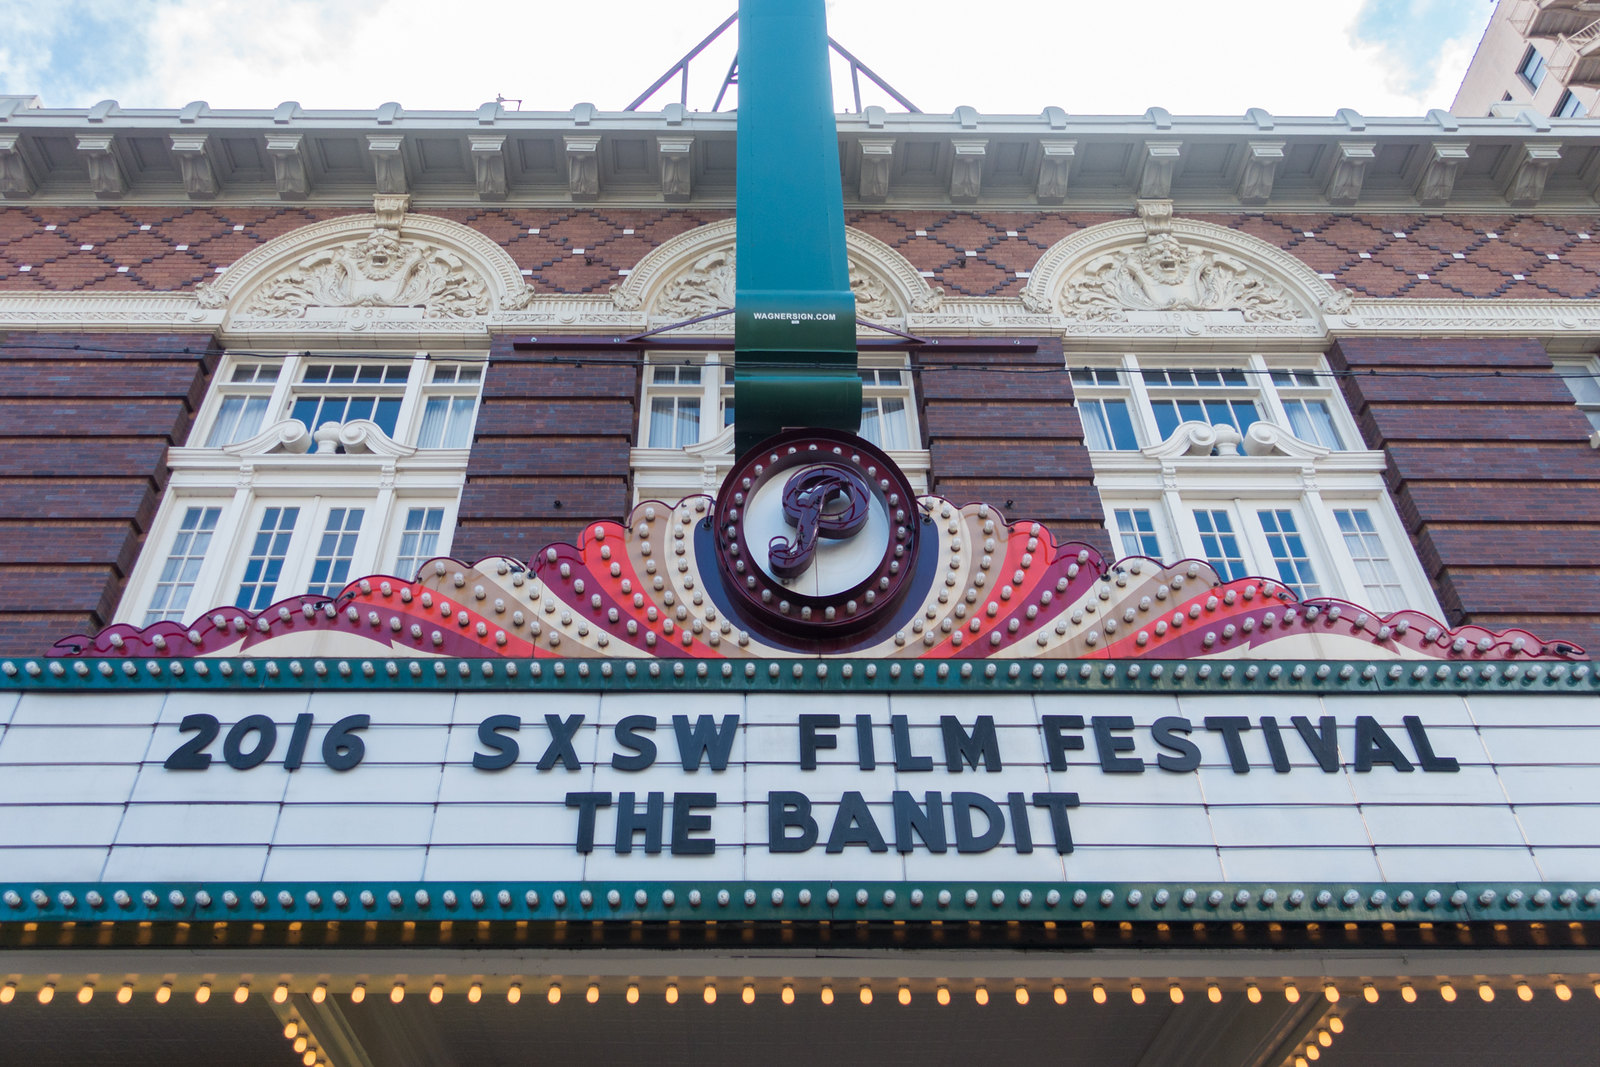 SXSW 2016 Day 2: The Bandit